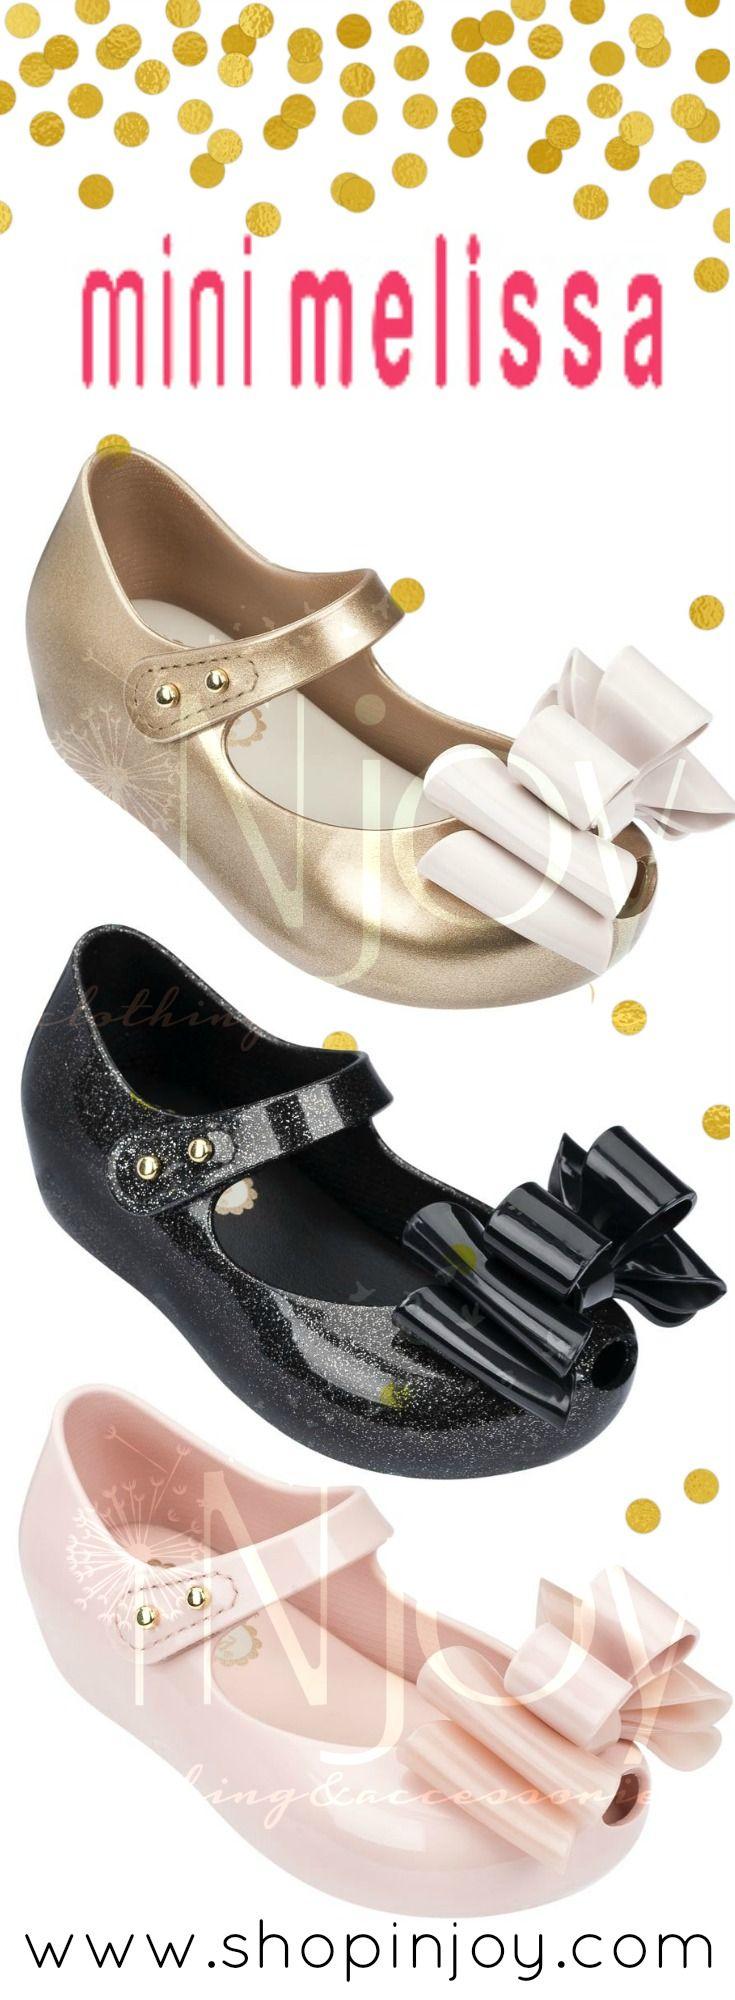 Mini Melissa Ultragirl Sweet III | Pink, Black Glitter & Gold Bow Shoes... COMING OCTOBER 2016